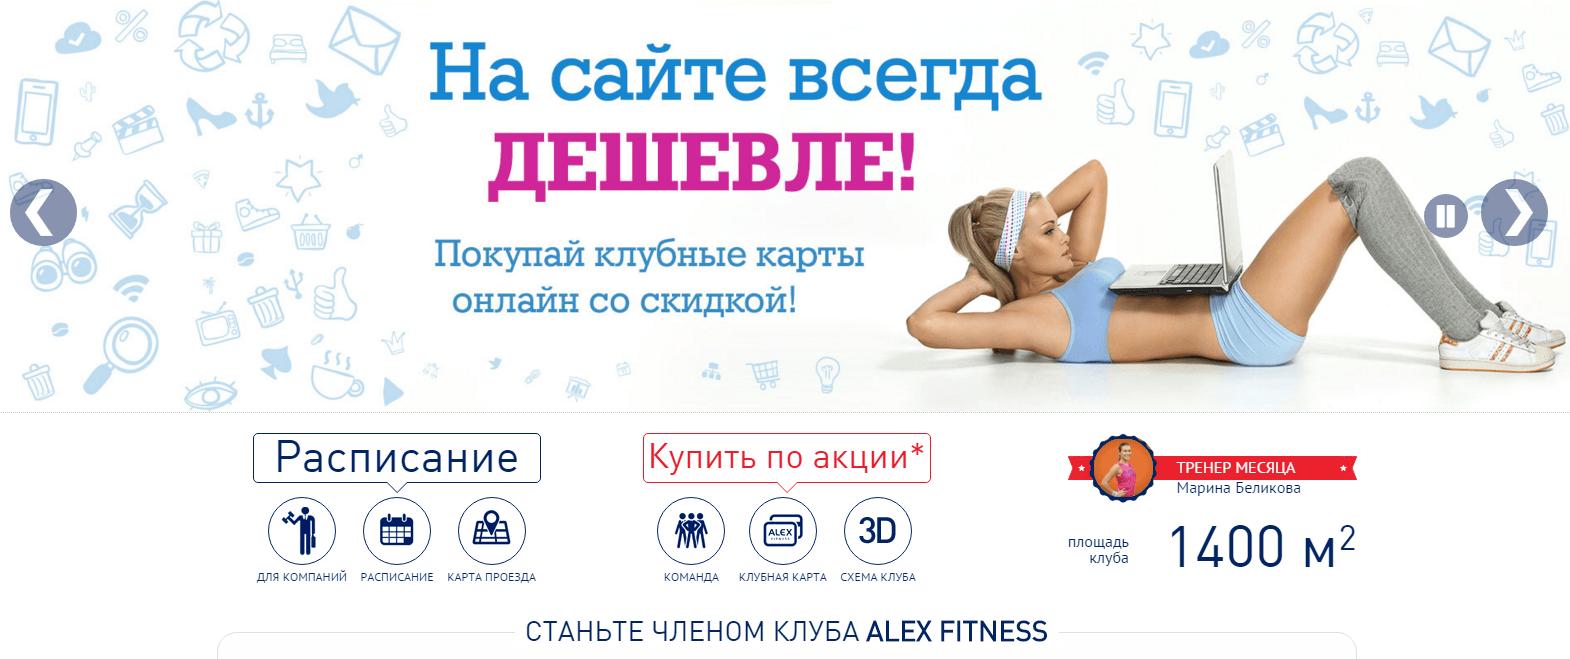 алекс фитнесс